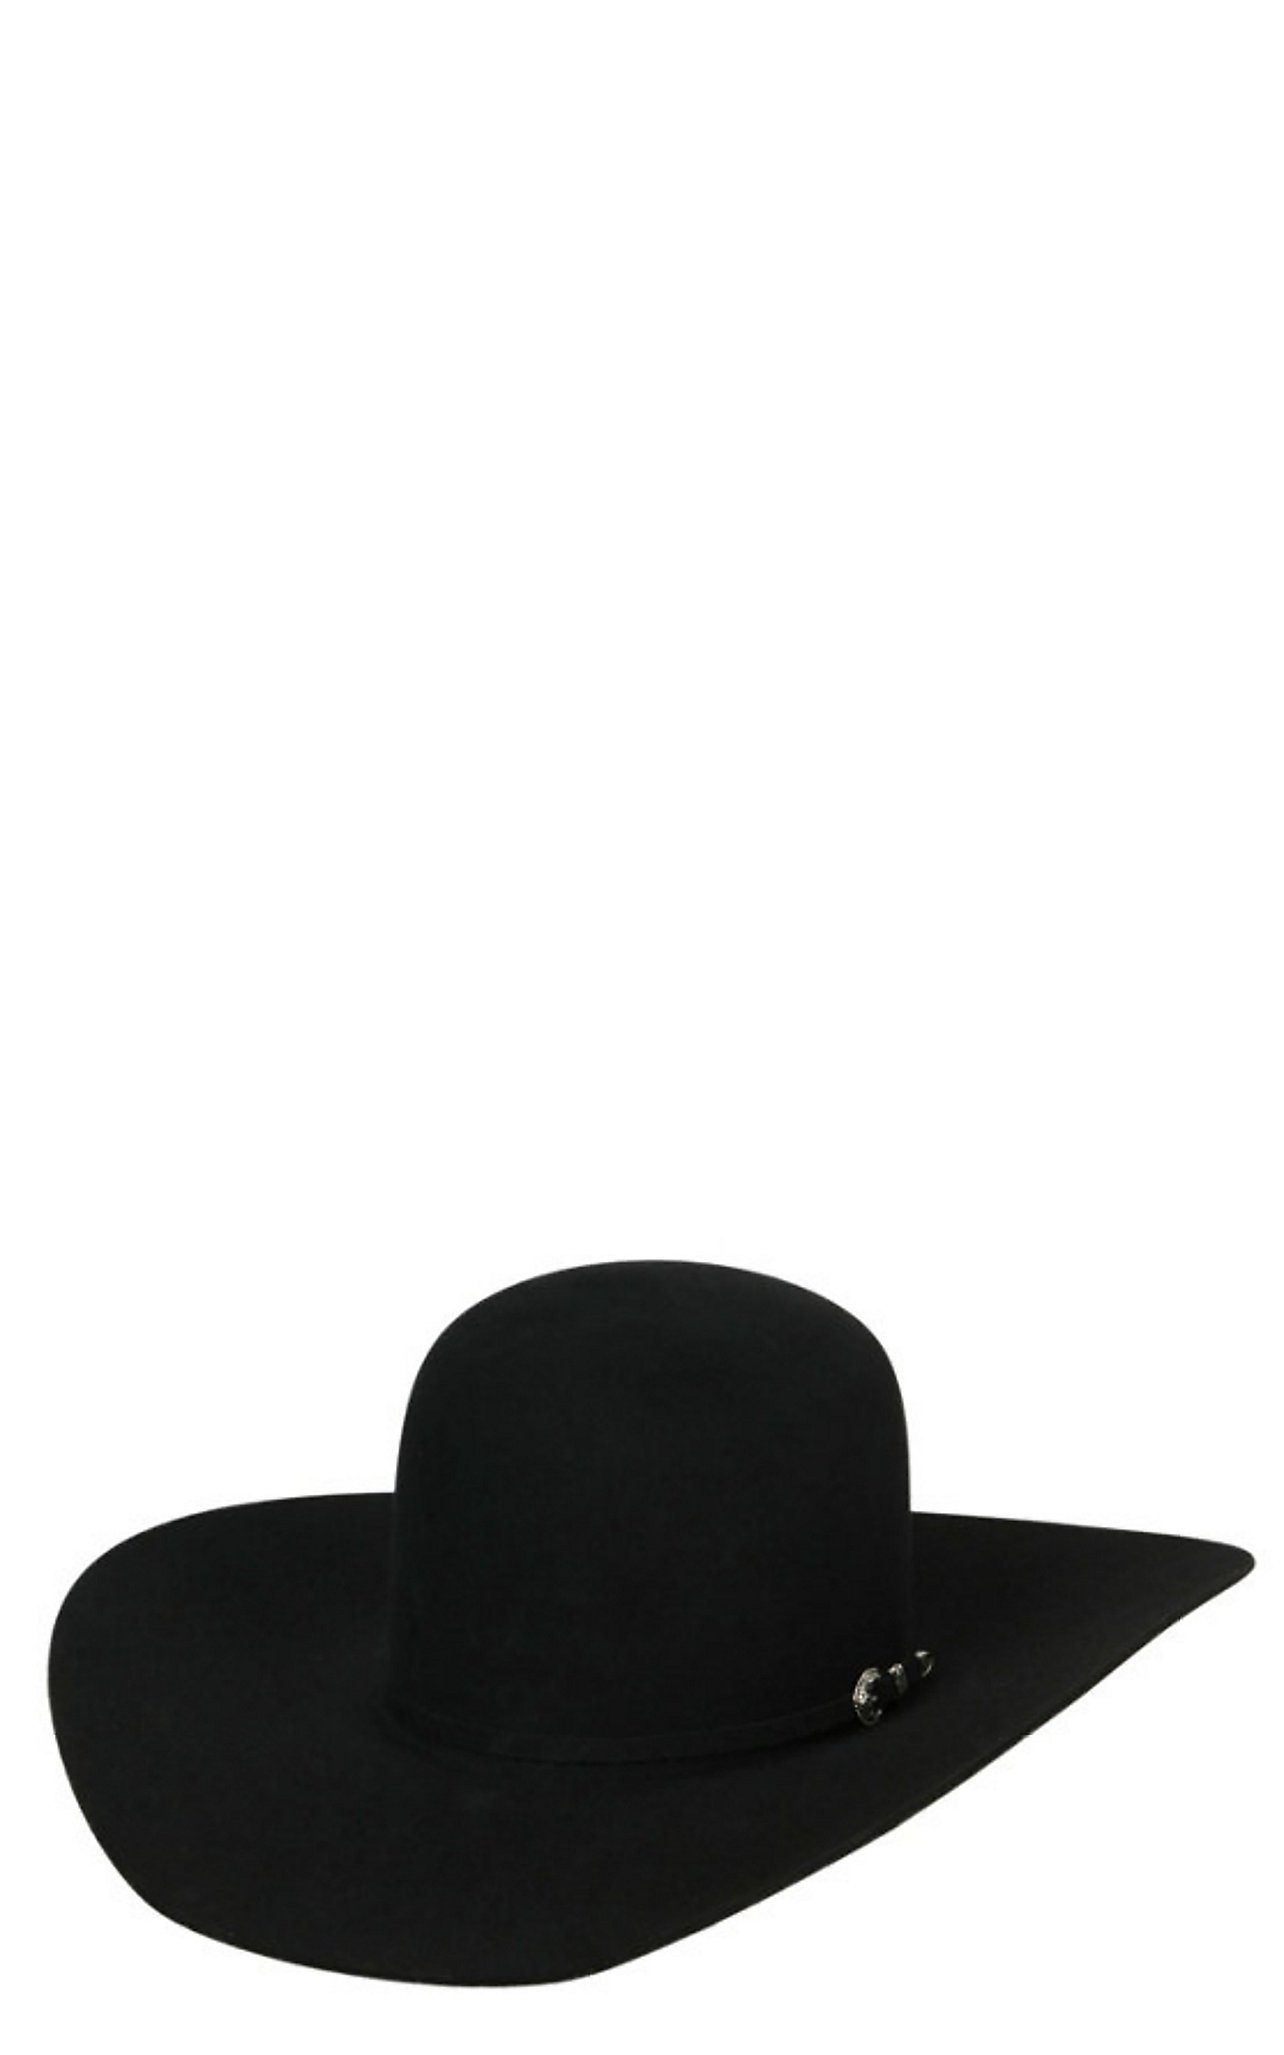 Rodeo King 7X Open Crown Black Felt Cowboy Hat 7XBLKOC45 e1d36f4a19c